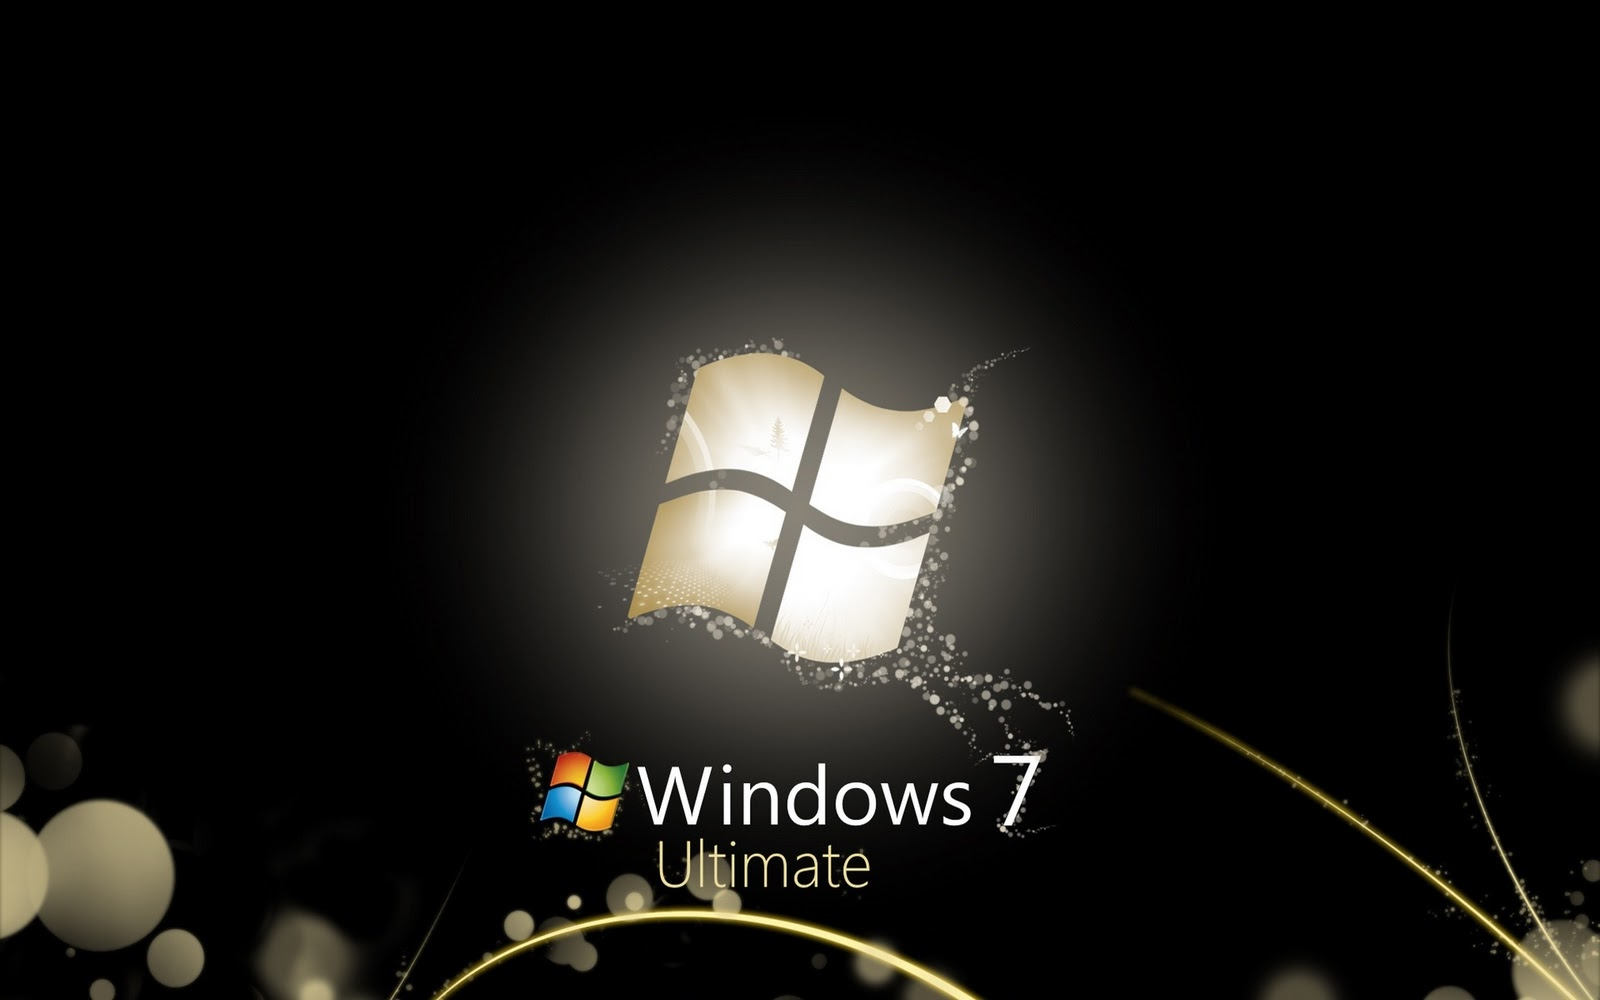 http://3.bp.blogspot.com/_RAlP3BmEW1Q/TQYPNyHoj5I/AAAAAAAACZw/dY9KLihy4nw/s1600/The-best-top-desktop-windows-7-wallpapers-20.jpg